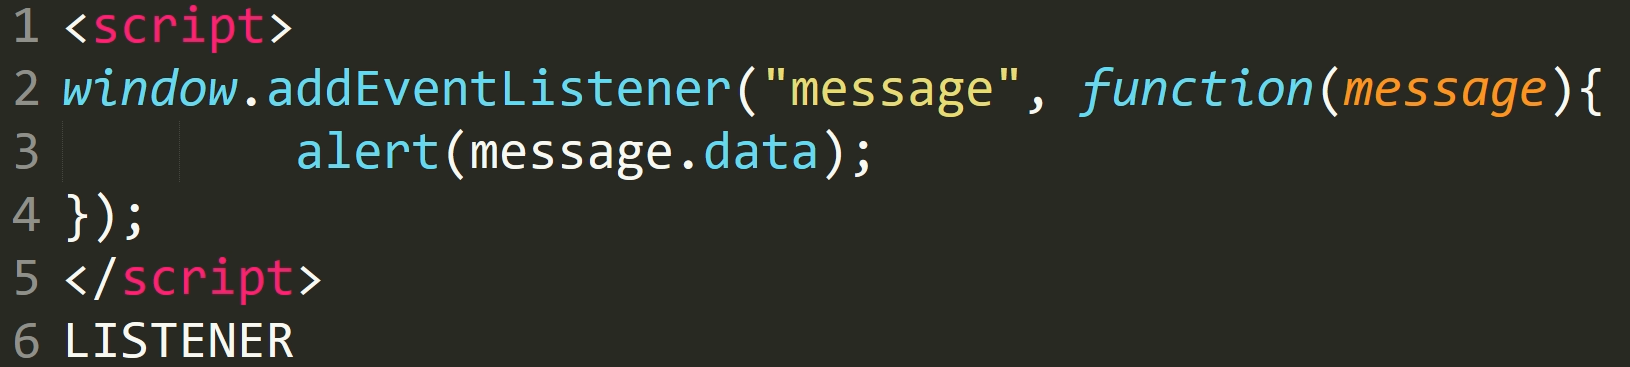 domain1 source code